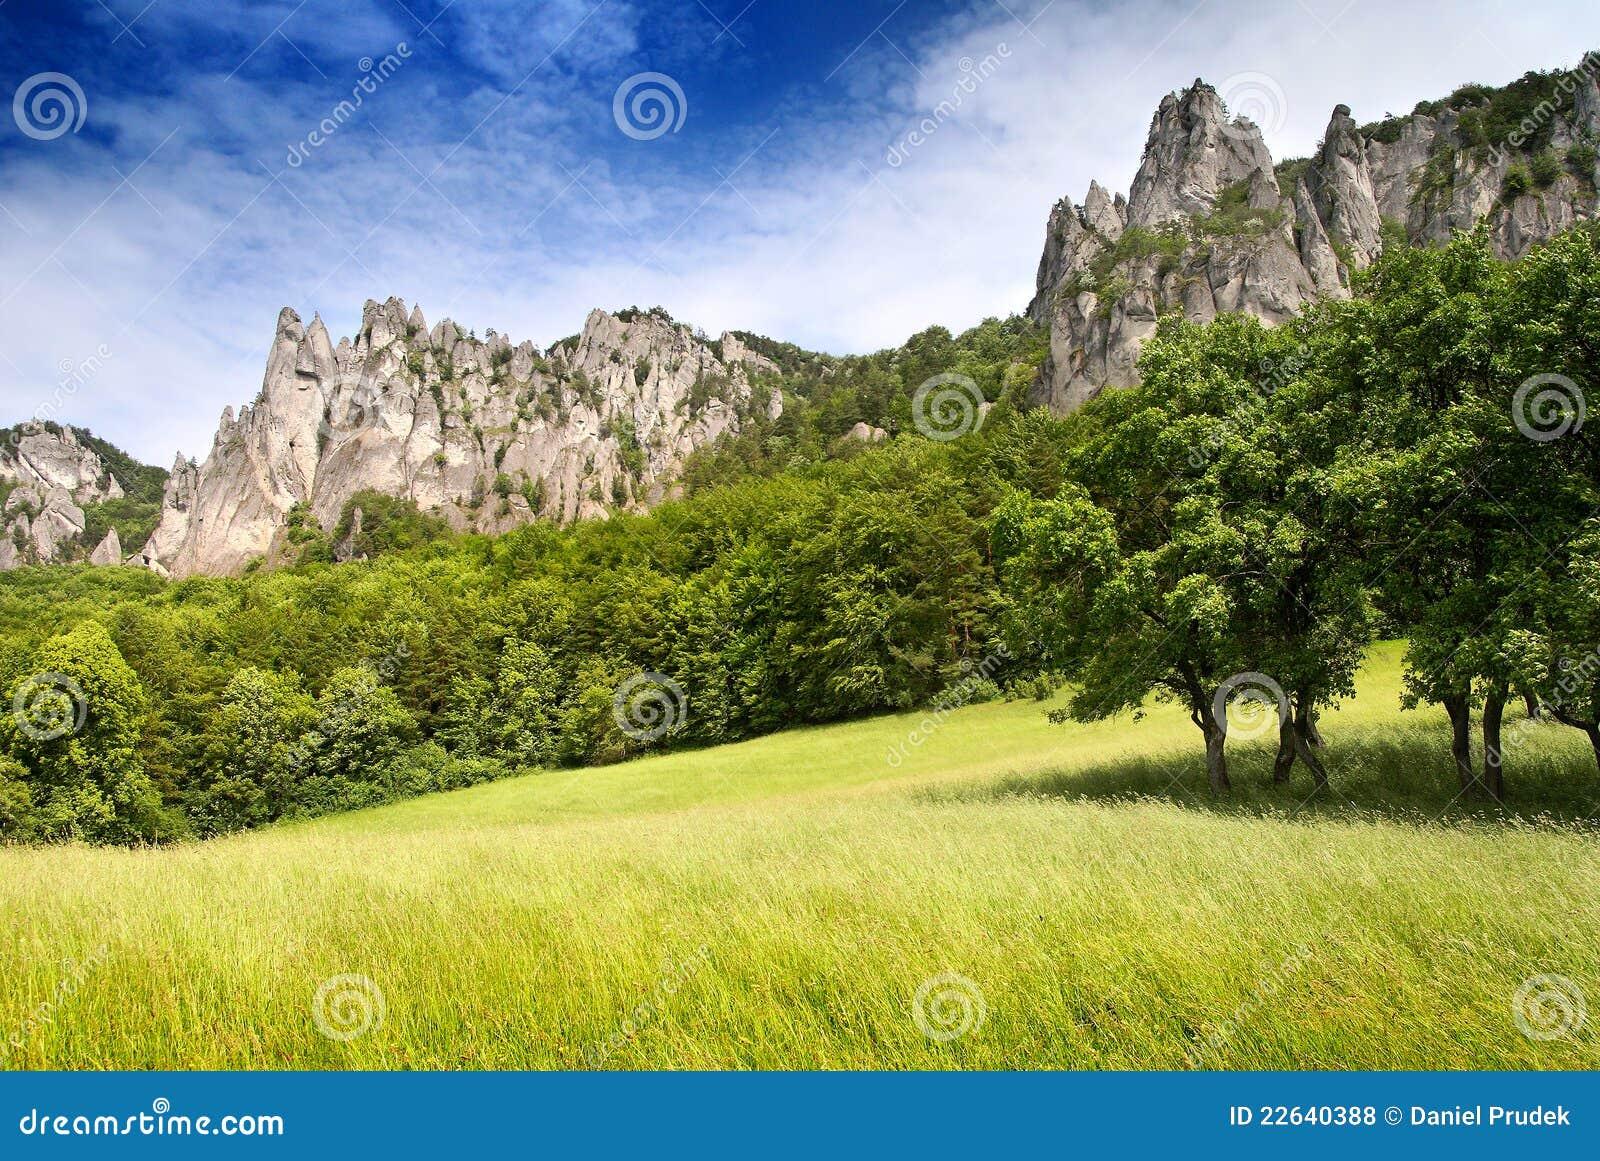 View of sulov rockies